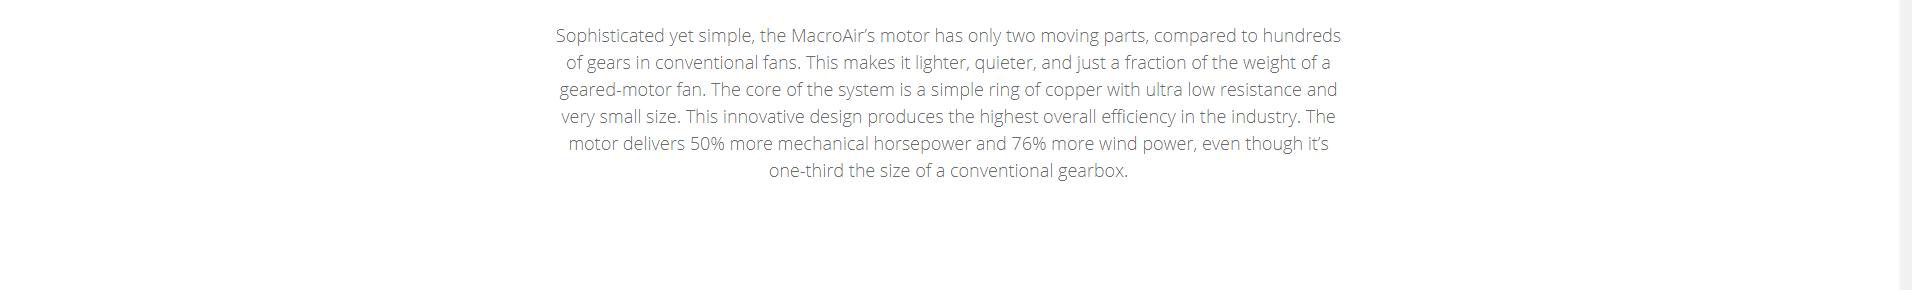 macroext 3.5.png